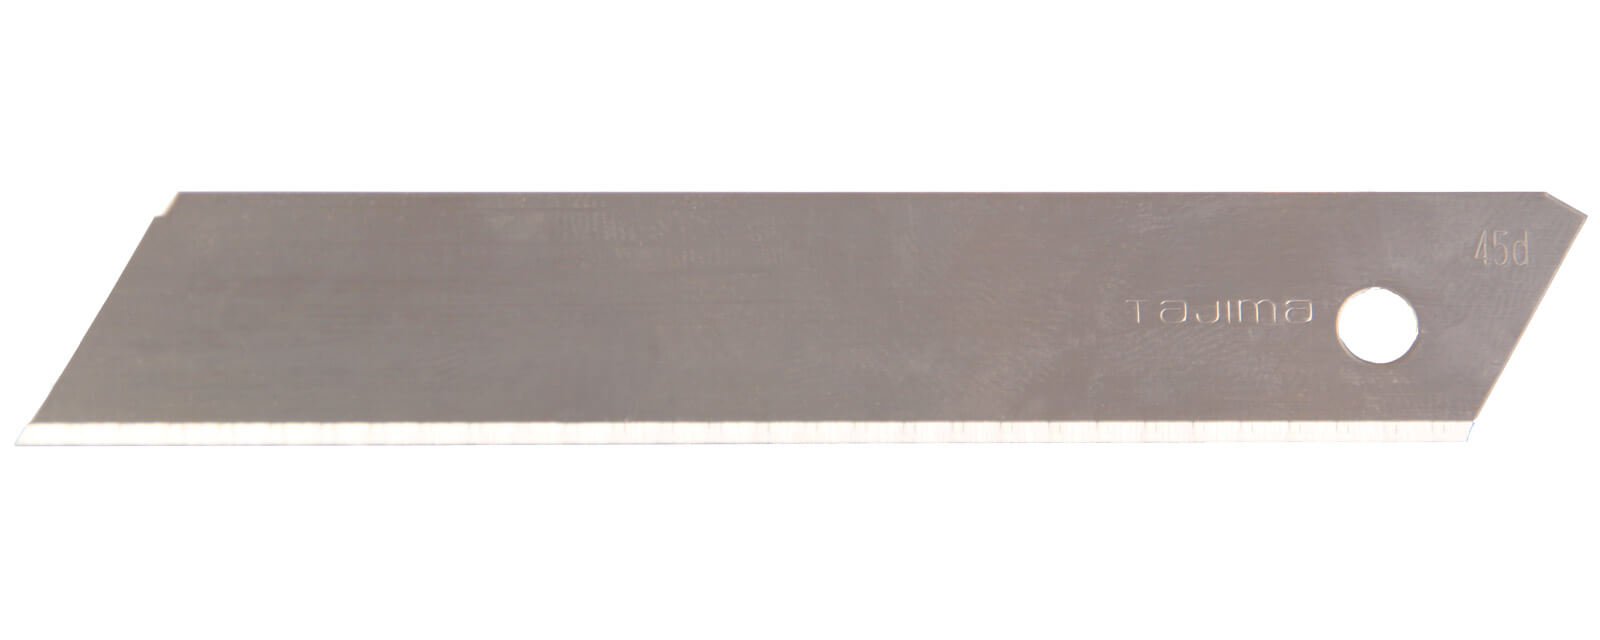 K043-Cuttermesser-Klinge-Abbrechklinge-18mm-ohne-Segmente-Sicherheitsklinge-CURT-tools